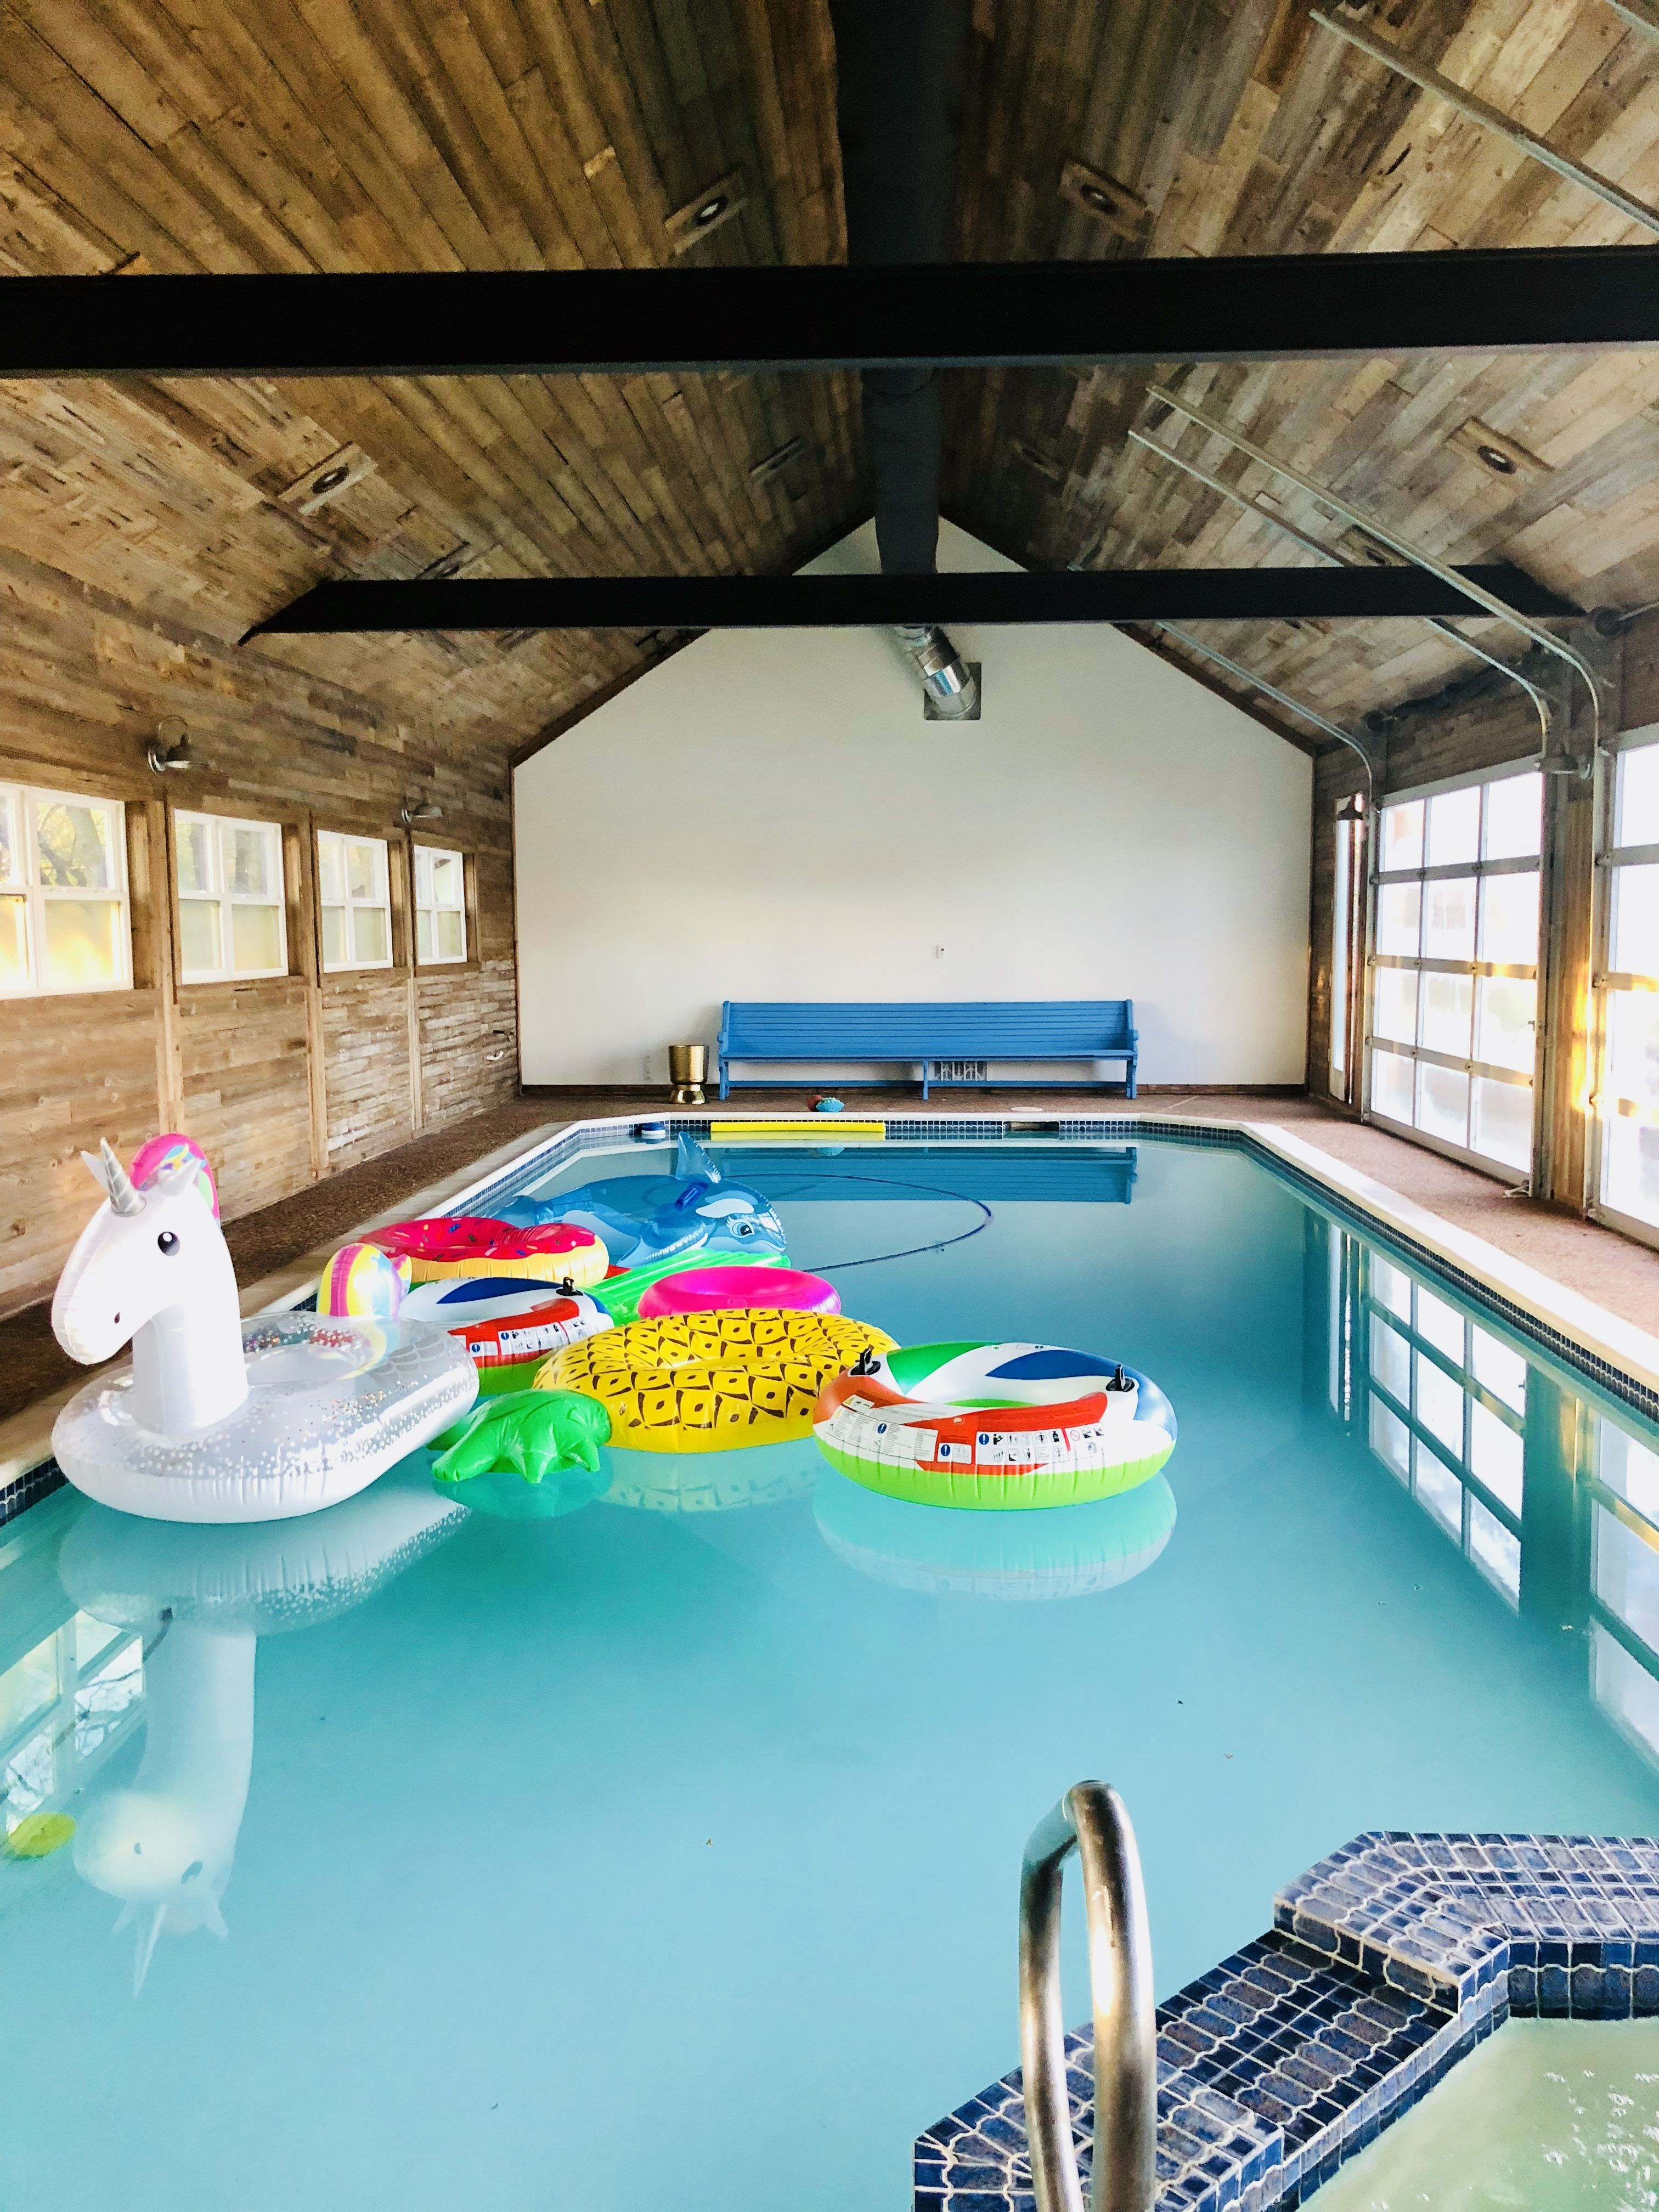 Katy Hot Springs Aquatic Facility Indoor Swimming Pool Aqua Climbing Wall Surface Lap Swimming Child Indoor Pool House Pool House Plans Indoor Outdoor Pool